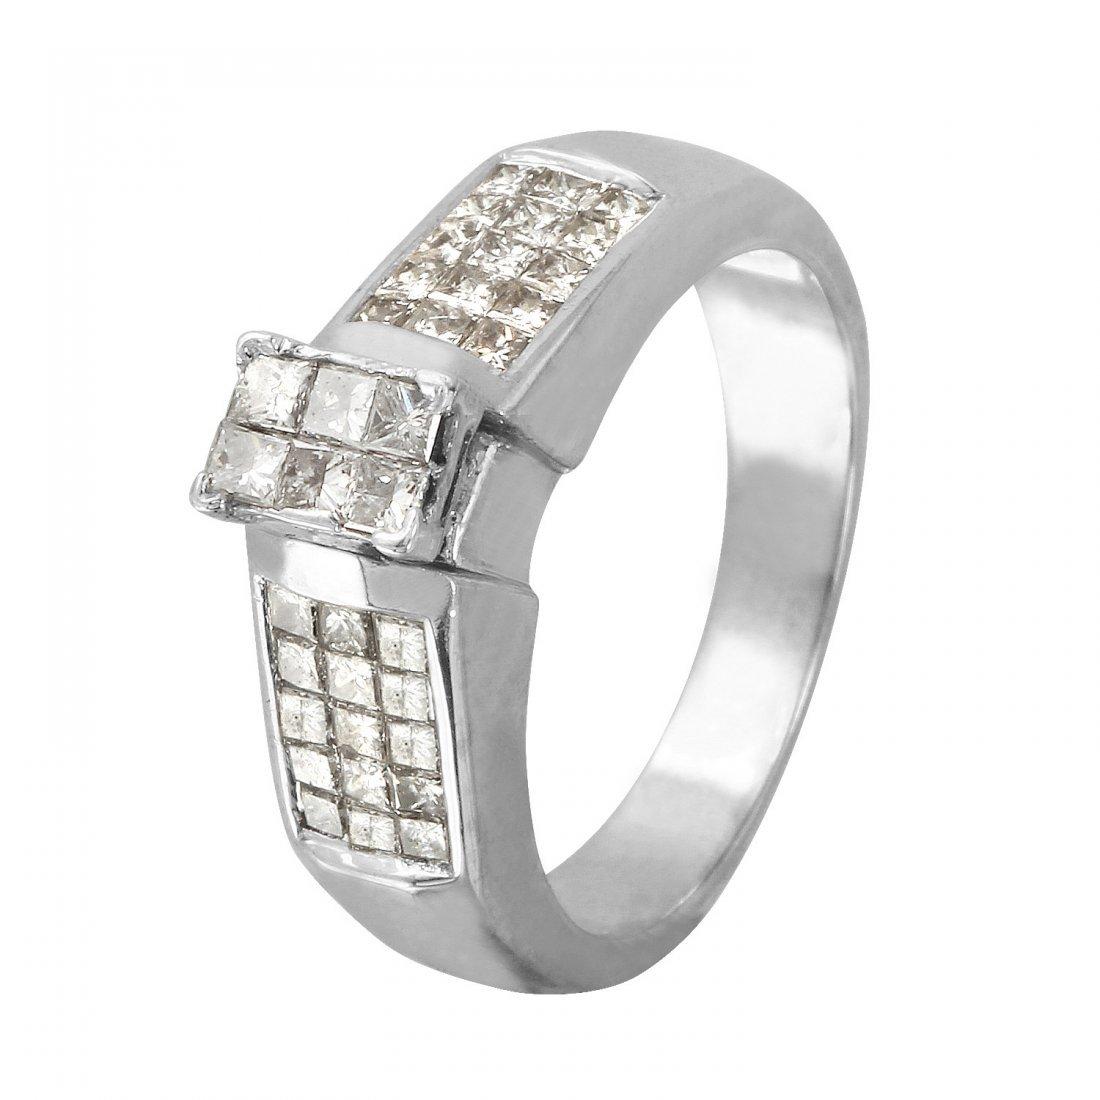 Ladies 1.47CTW Diamond 14K White Gold Ring